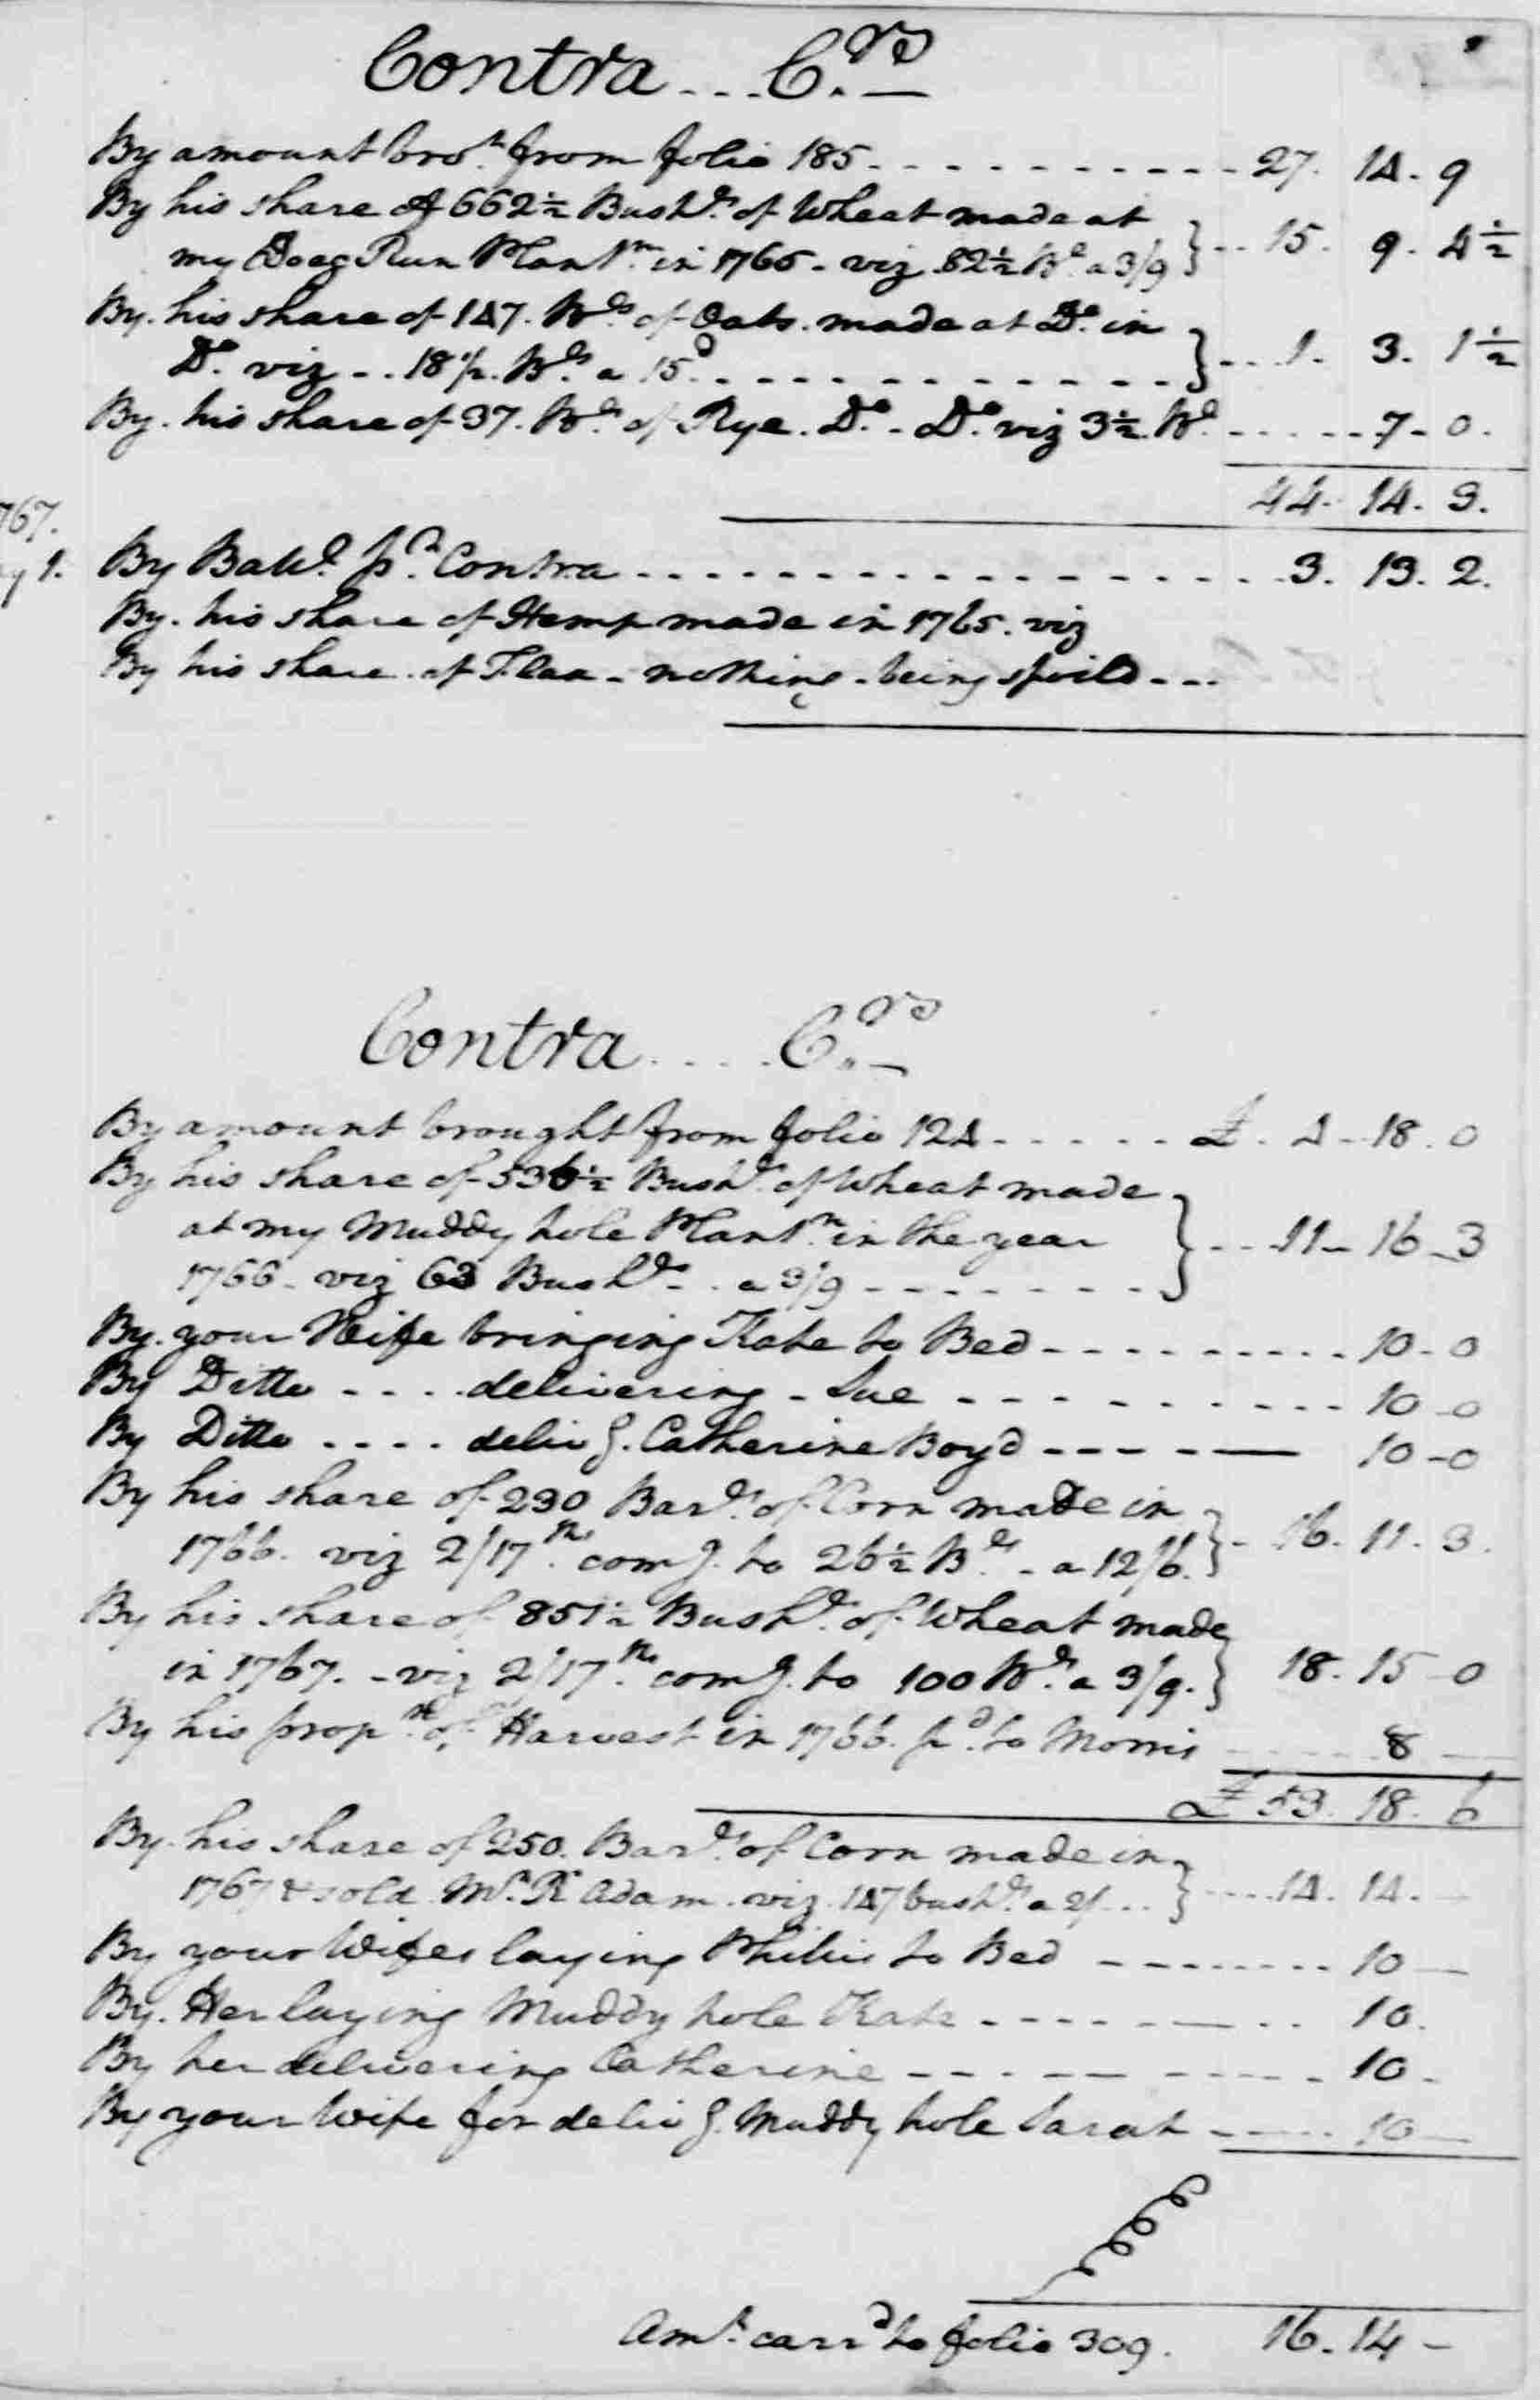 Ledger A, folio 247, right side